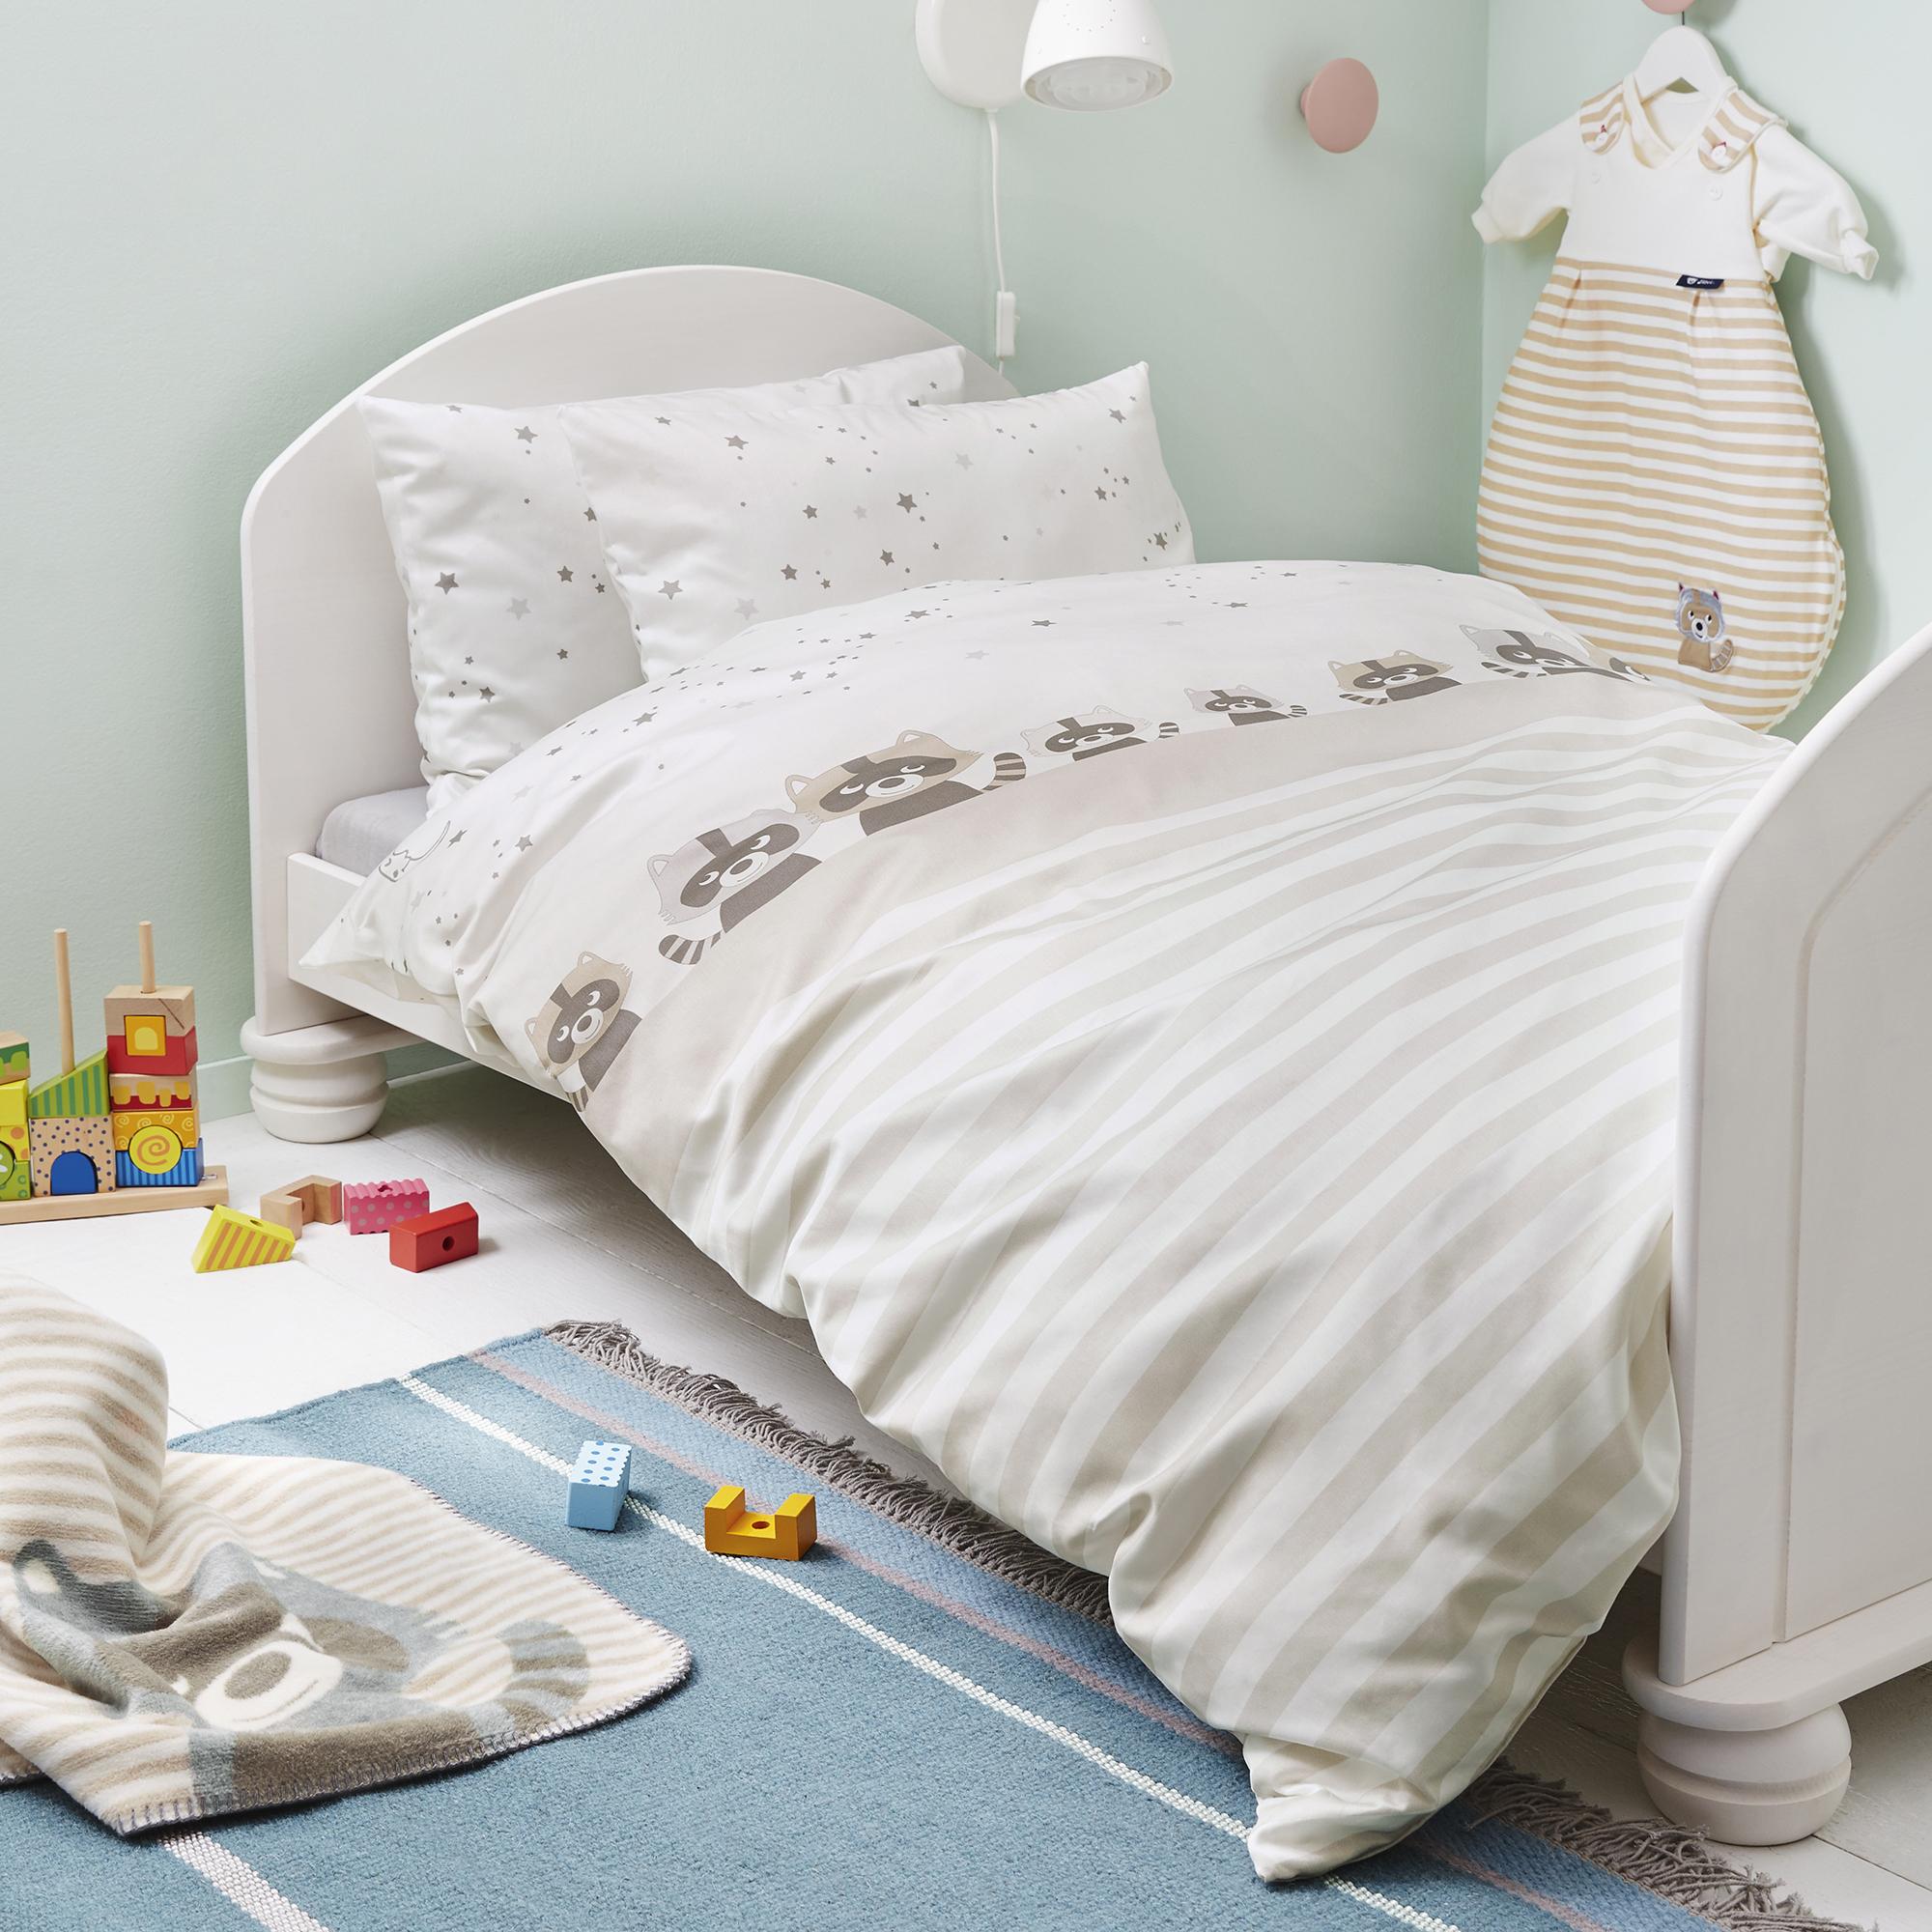 renforc bettw sche s oliver junior kinderbettw sche bettw sche ibena online shop. Black Bedroom Furniture Sets. Home Design Ideas